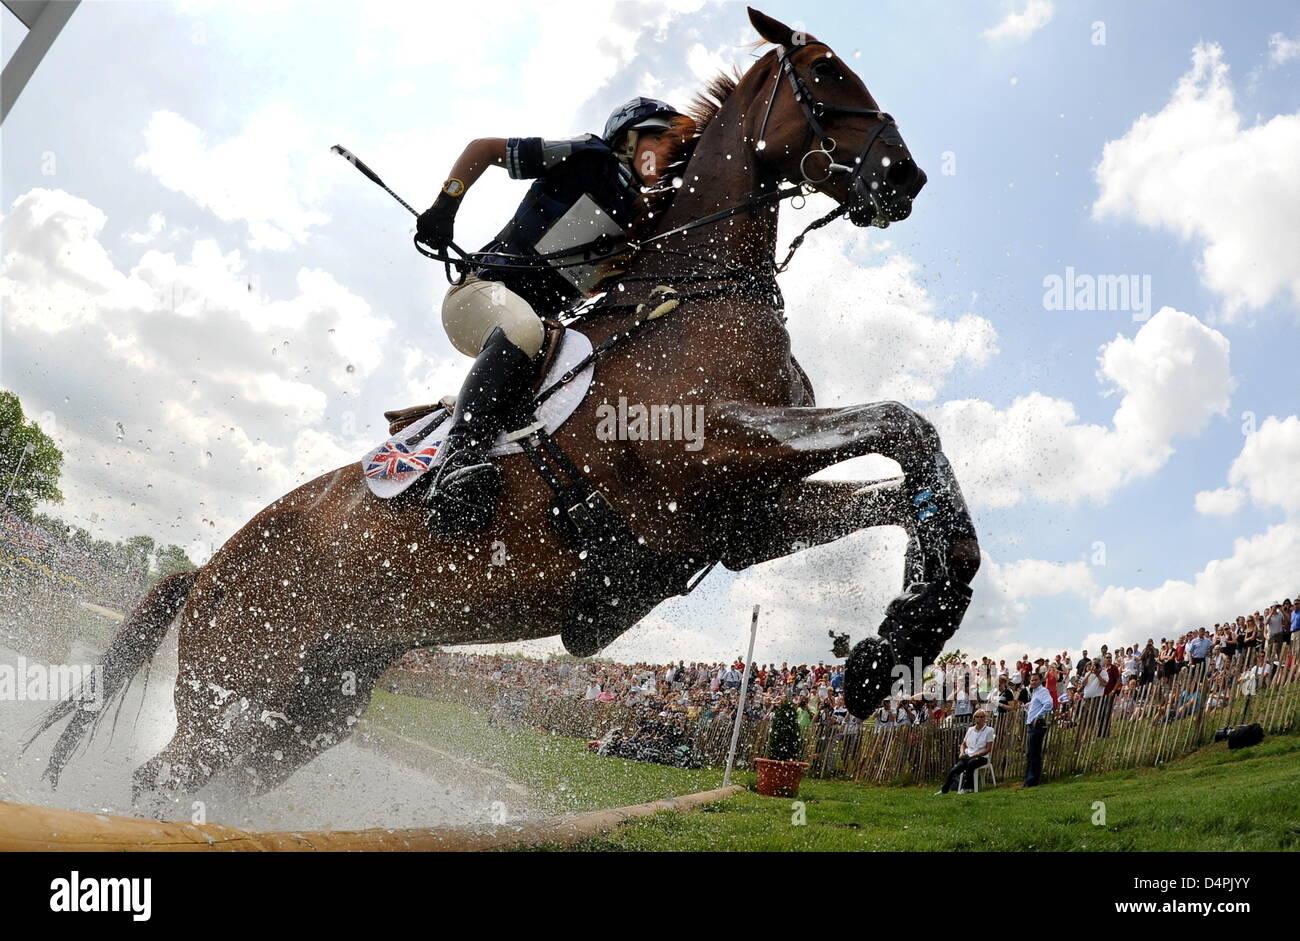 British eventing equestrian Lucy Wiegersma and her horse ?Inigo Jones? come through at the World Equestrian Festival - Stock Image